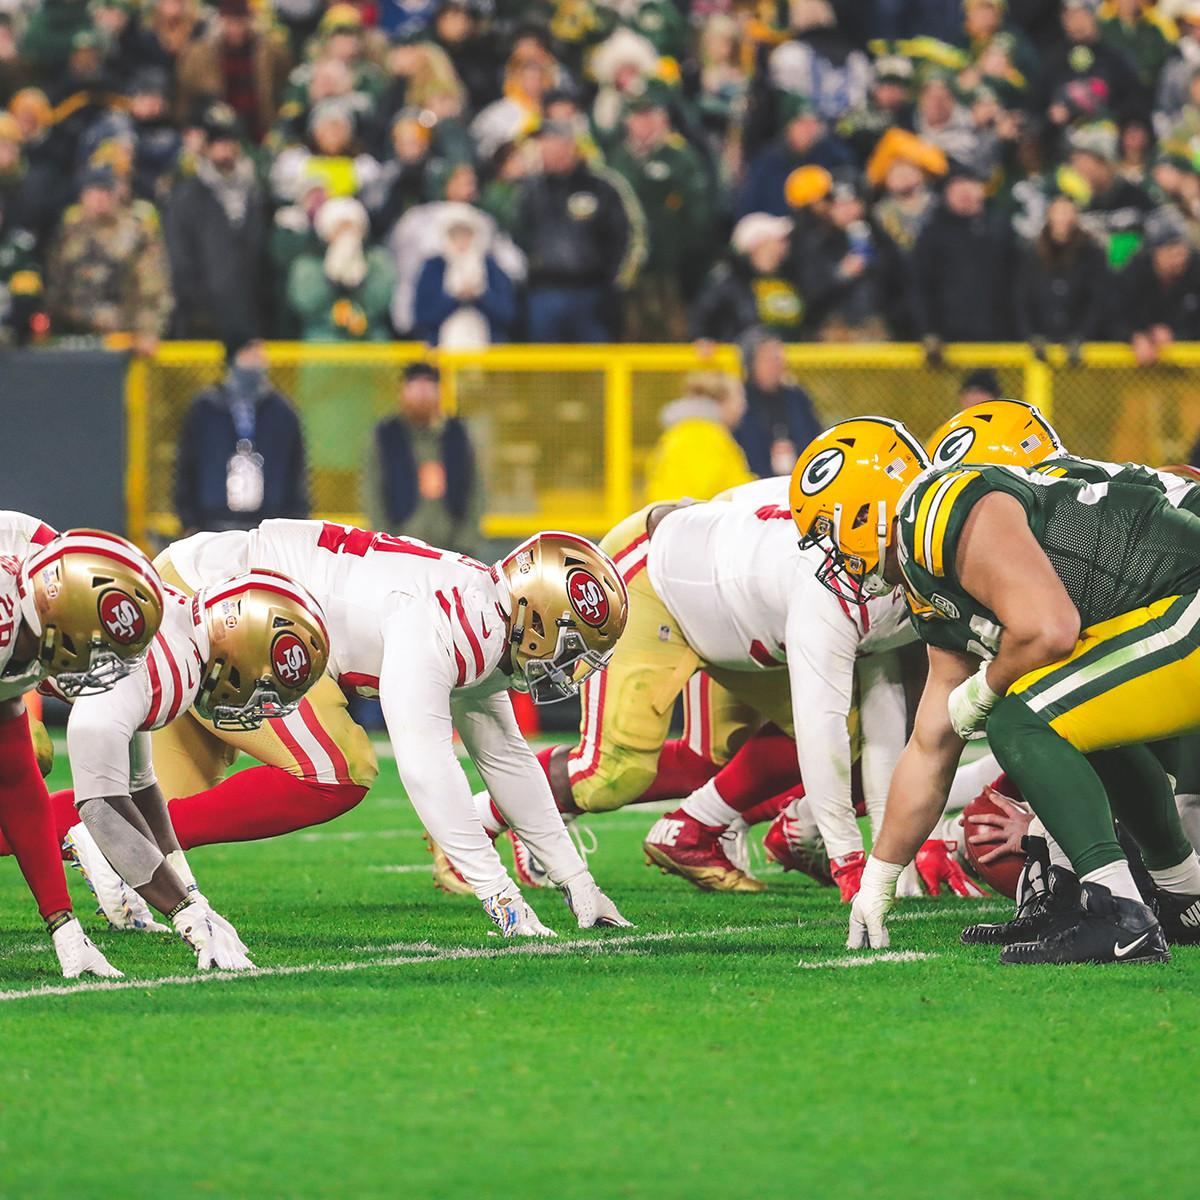 Sunday, Nov. 24 vs. Packers